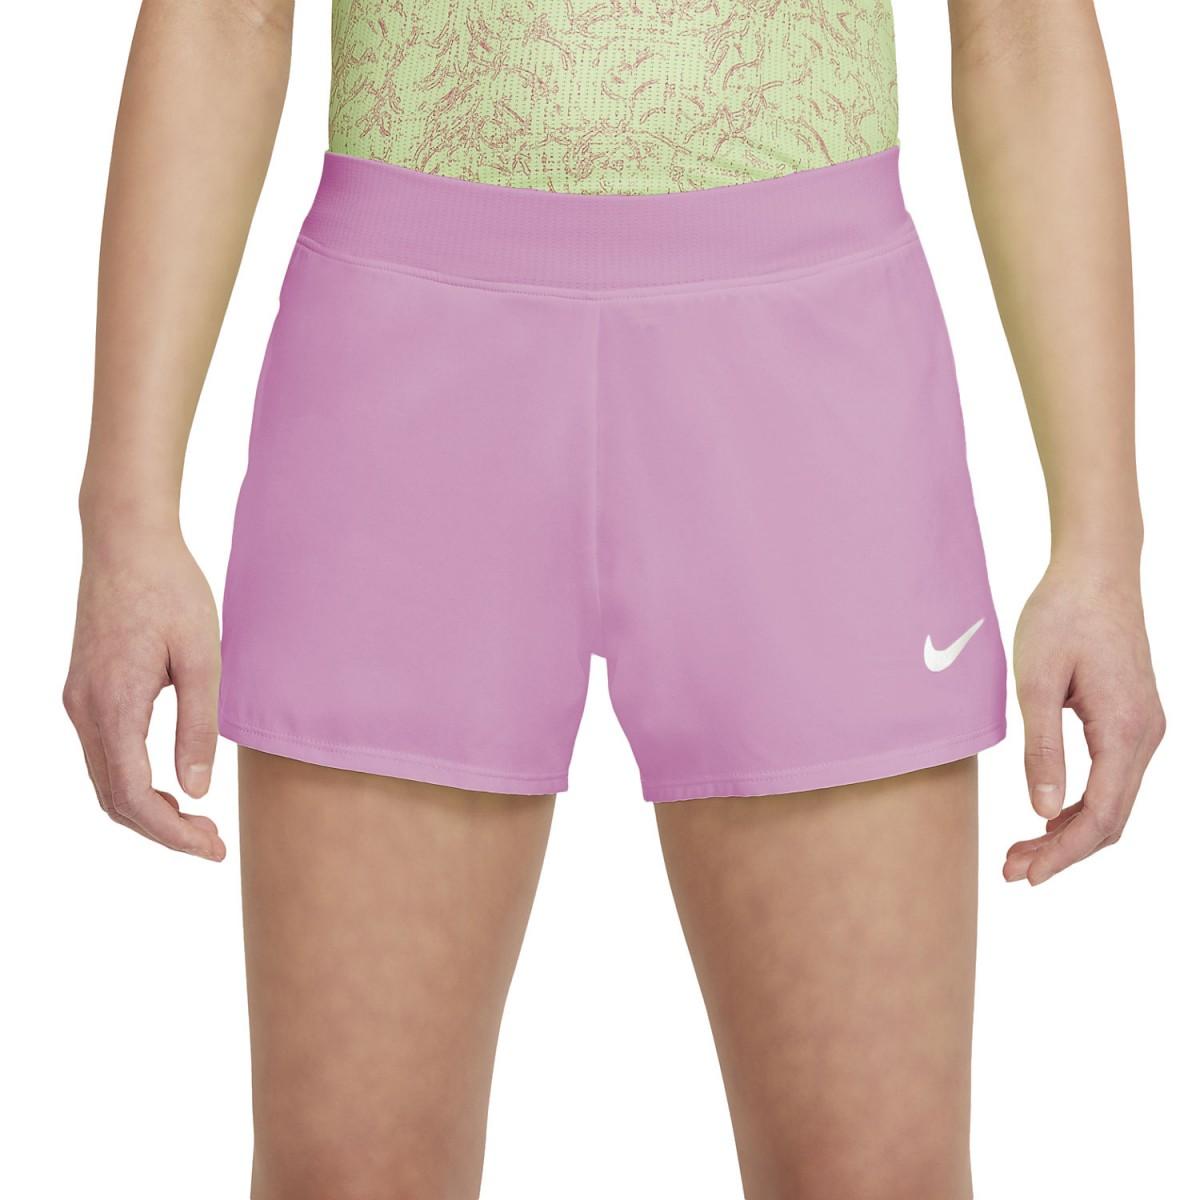 Теннисные шорты детские Nike Court Victory Short elemental pink/elemental pink/white